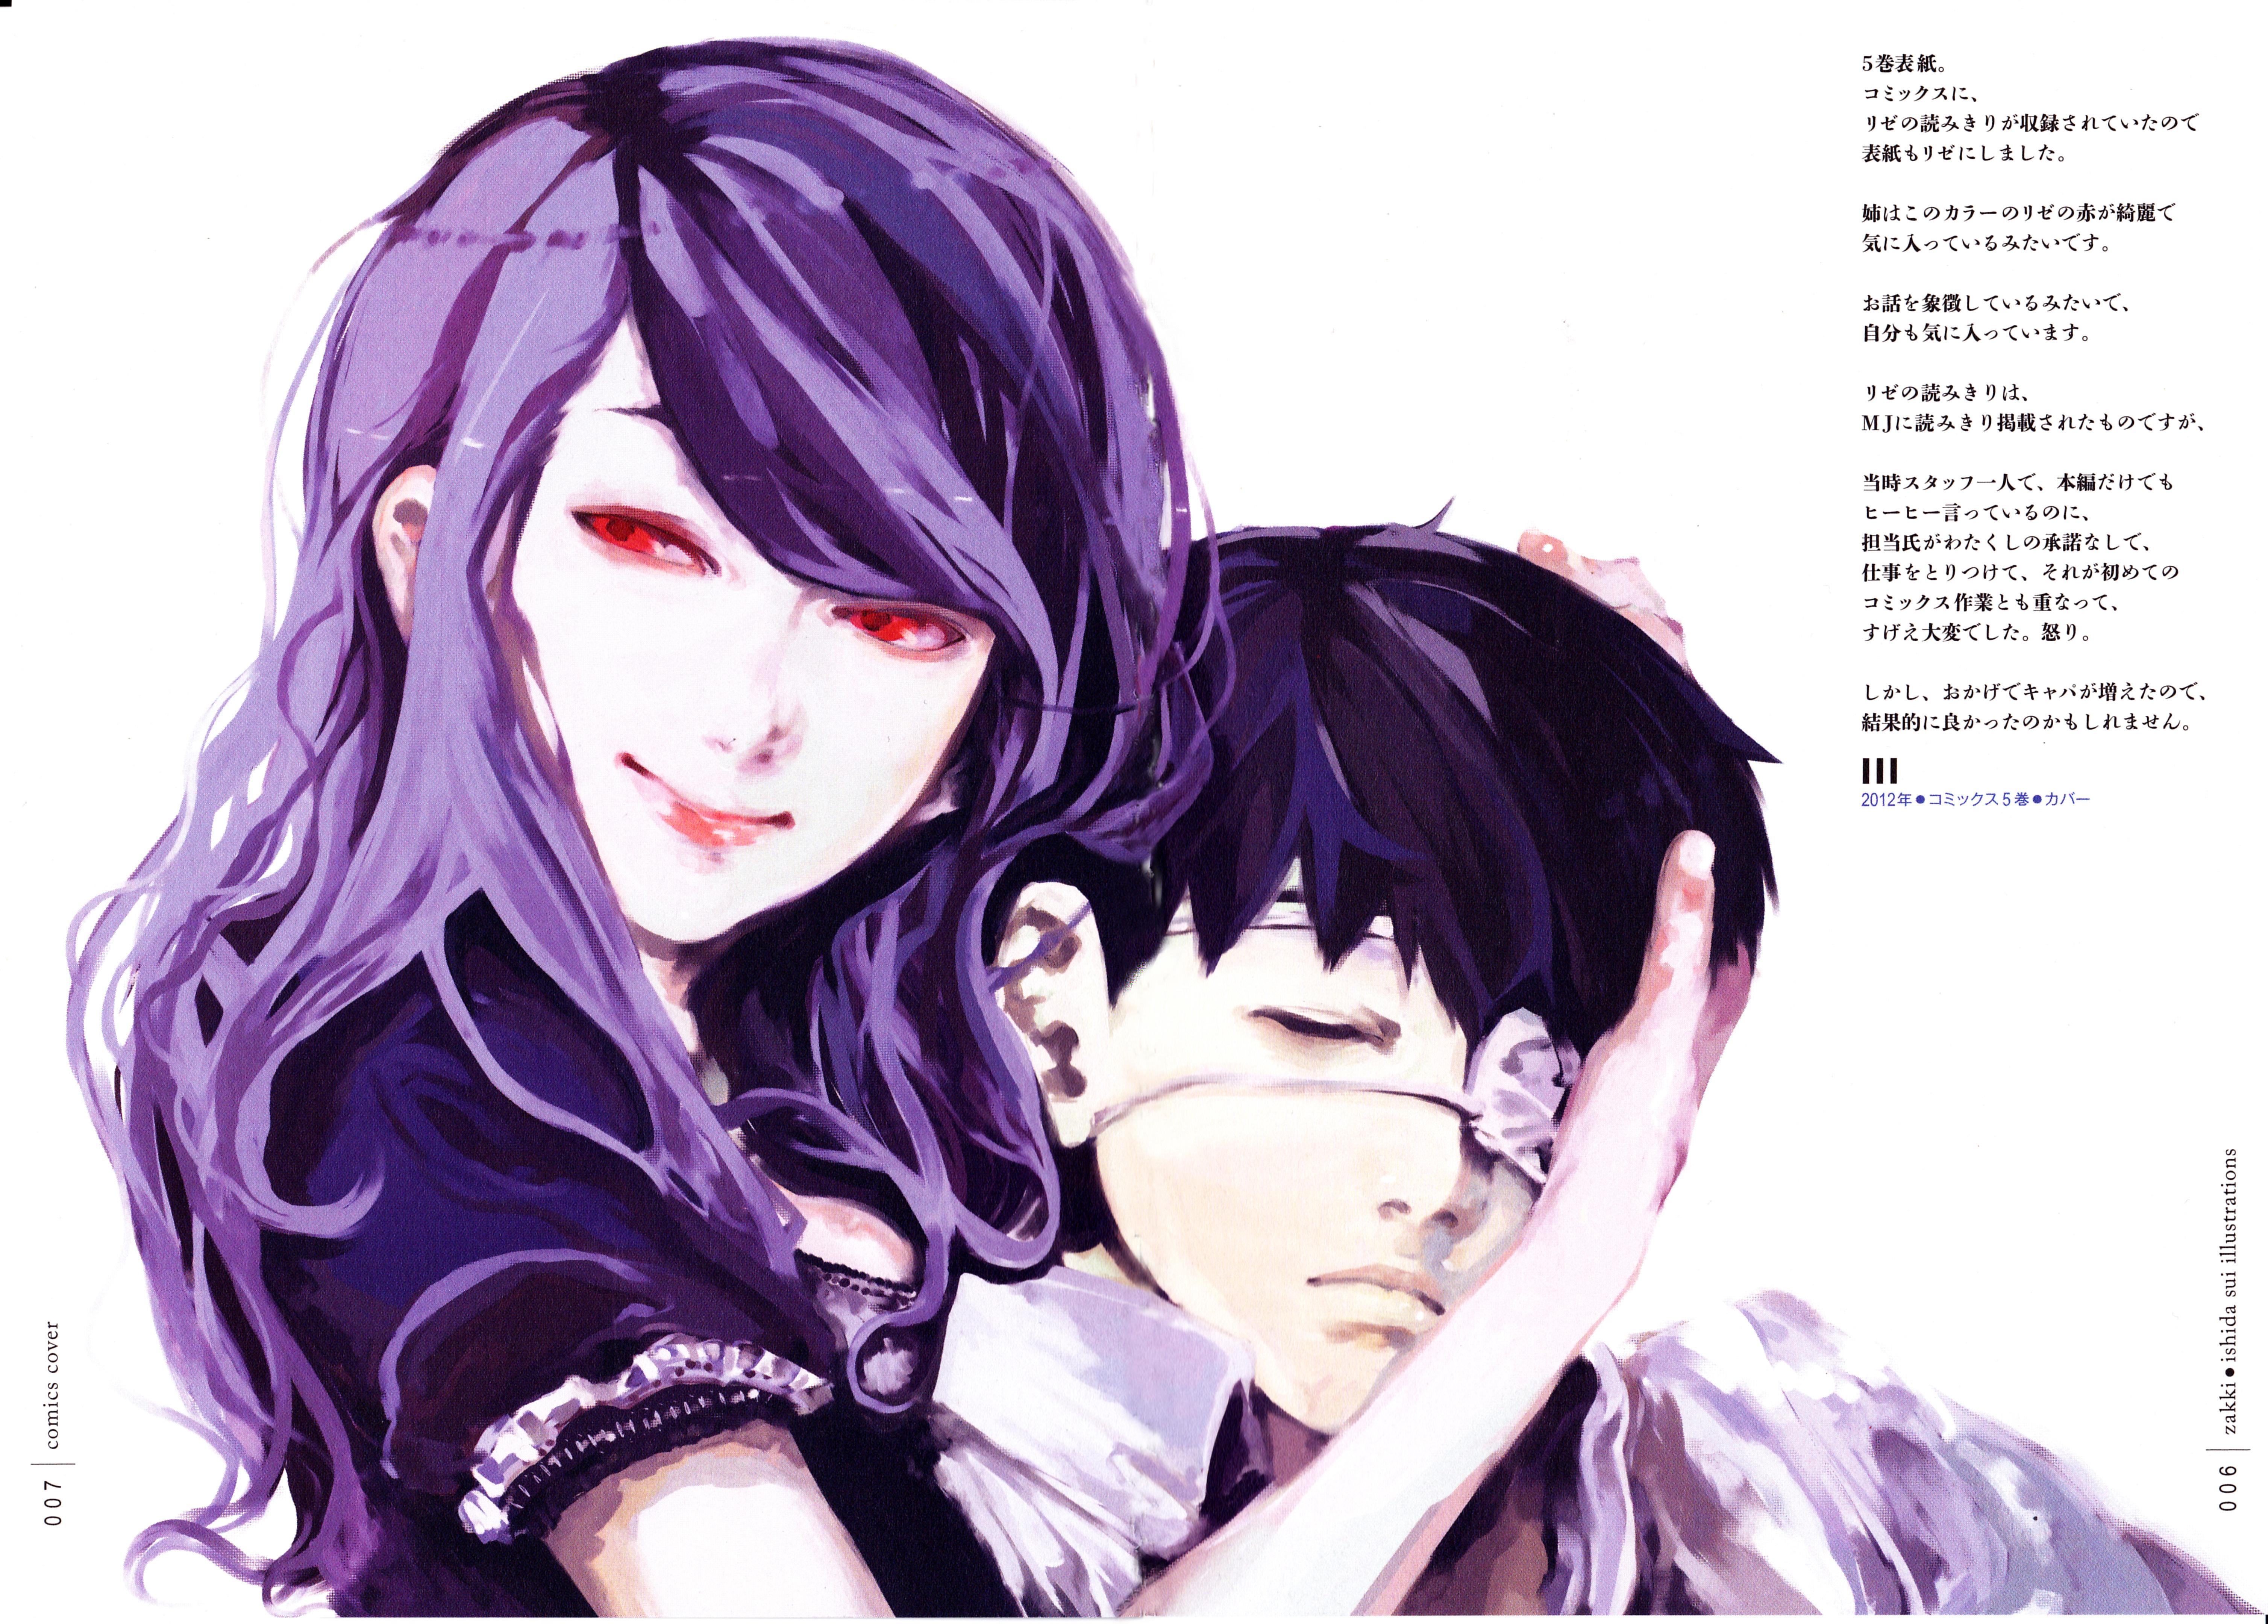 Tokyo Ghoul Zakki - Ishida Sui - Zerochan Anime Image Board